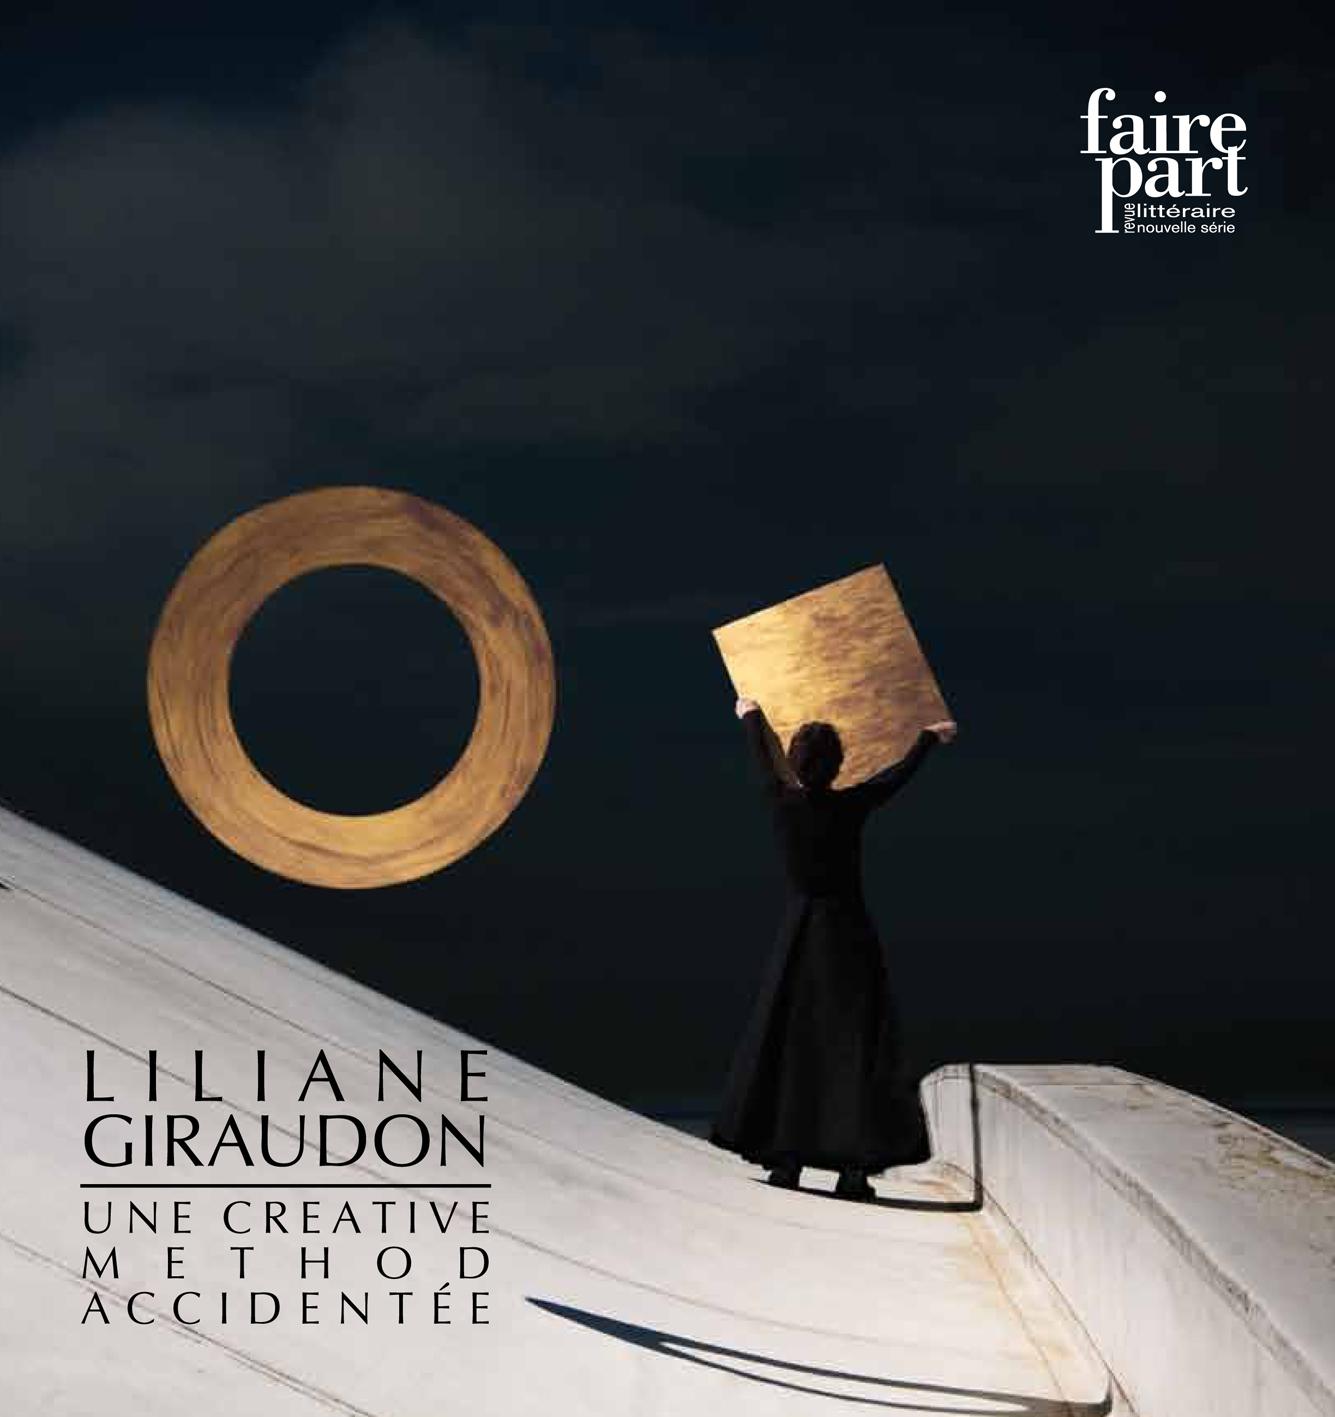 REVUE FAIRE PART : LILIANE GIRAUDON : UNE CREATIVE METHOD ACCIDENTEE